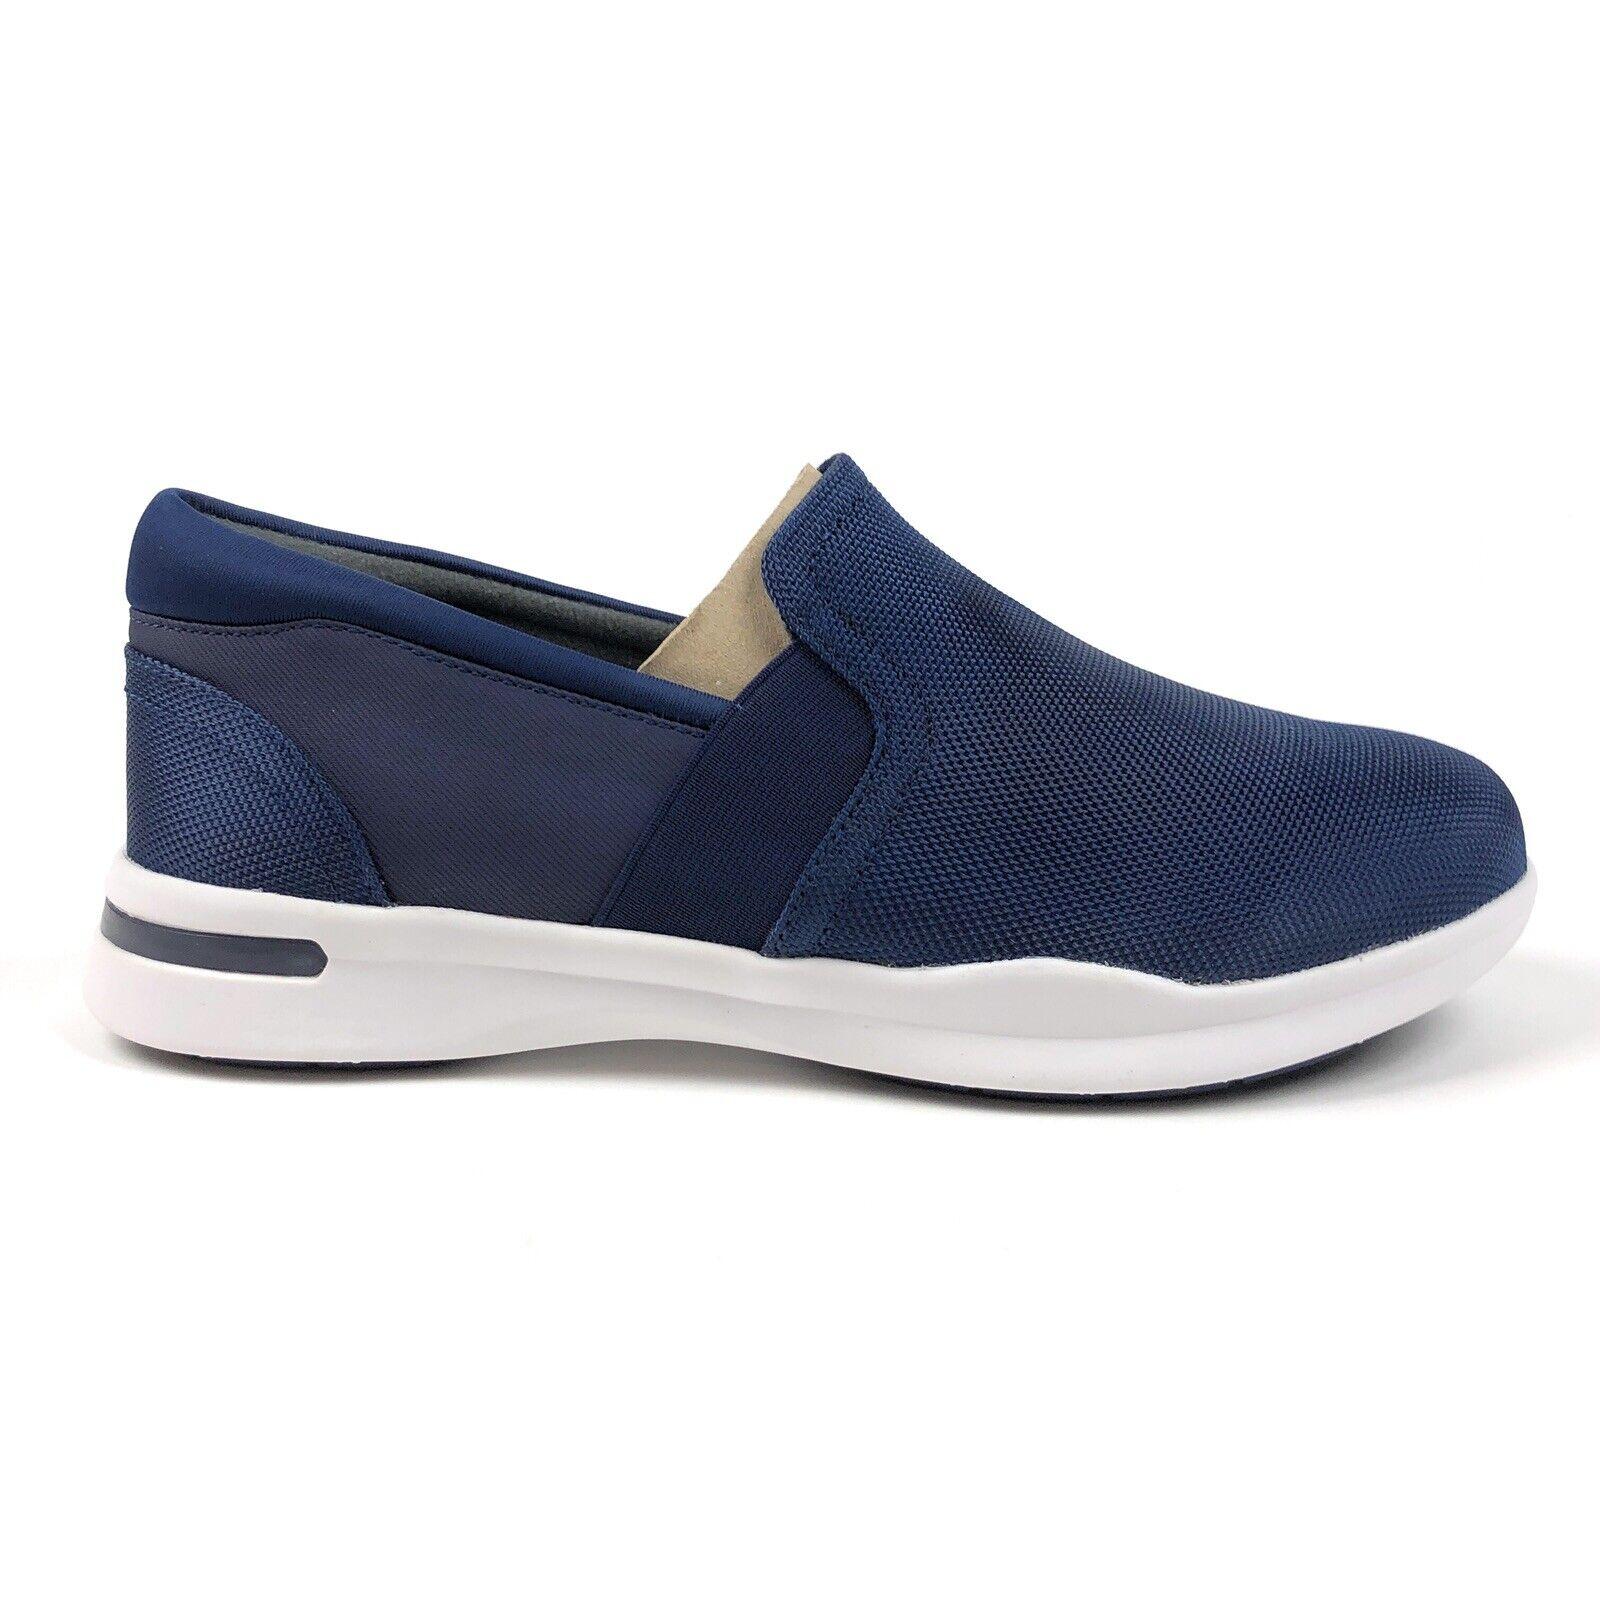 Softwalk Greys Anatomy Vantage Womens 8.5 Blue Slip On Loafers Shoes G1600-427